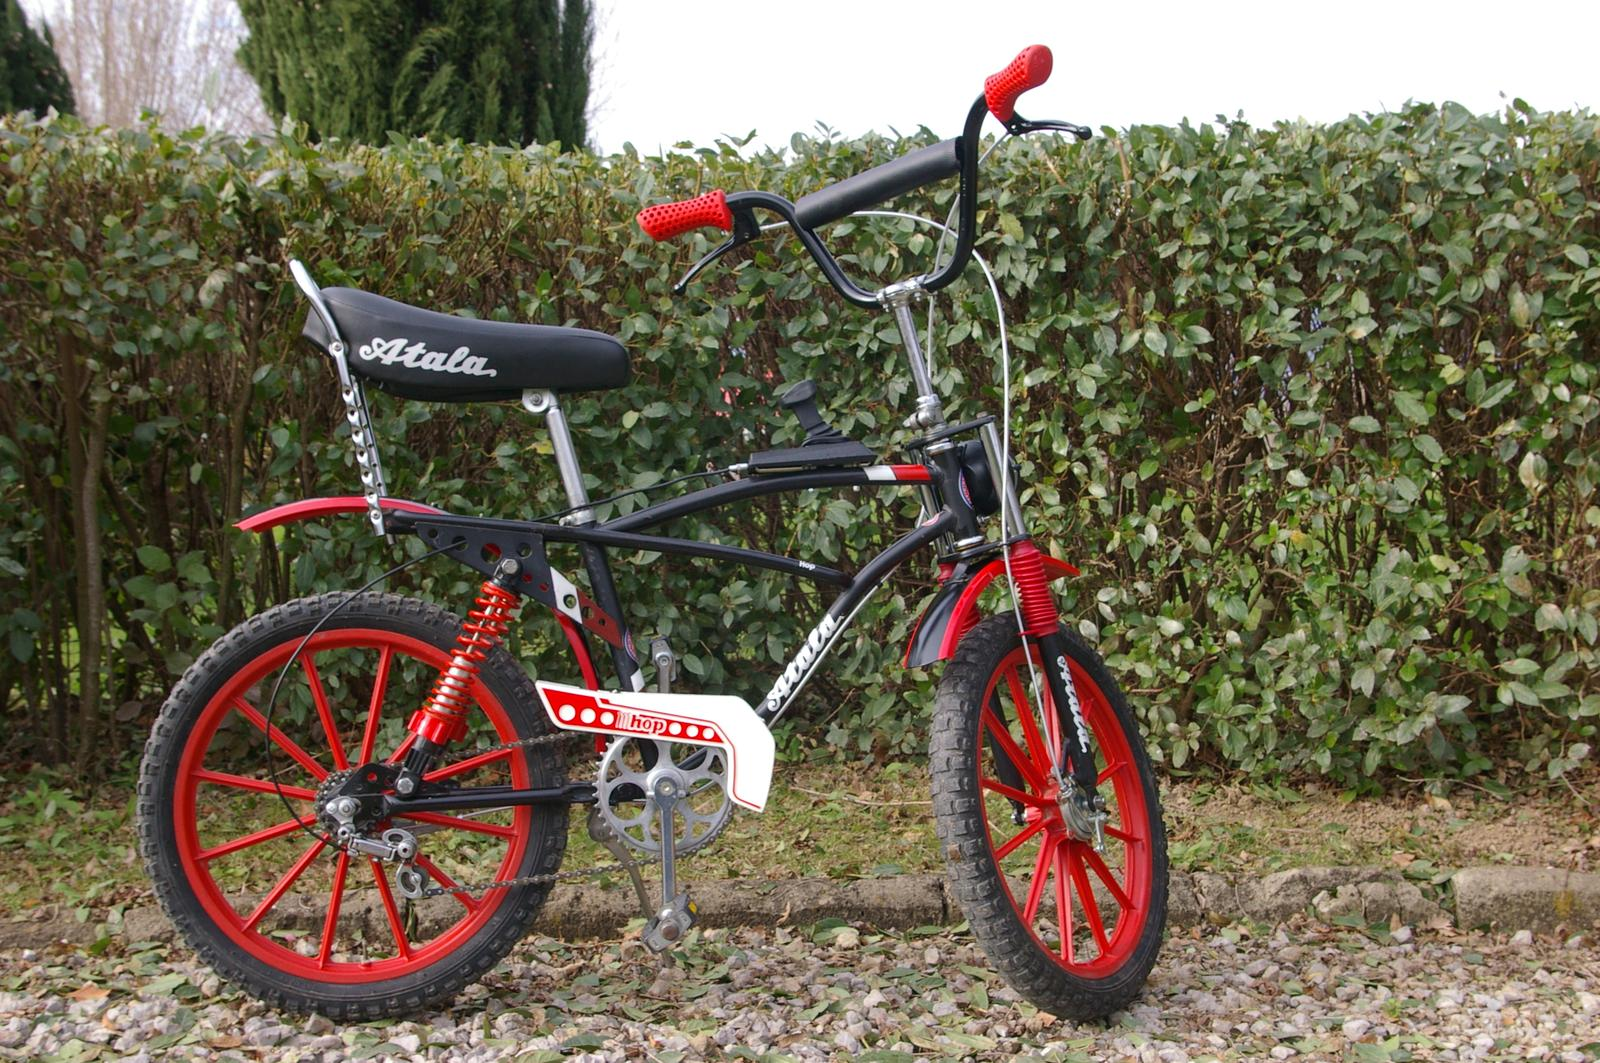 Mtb Magcom Mountain Bike Online Magazine Bici Della Settimana